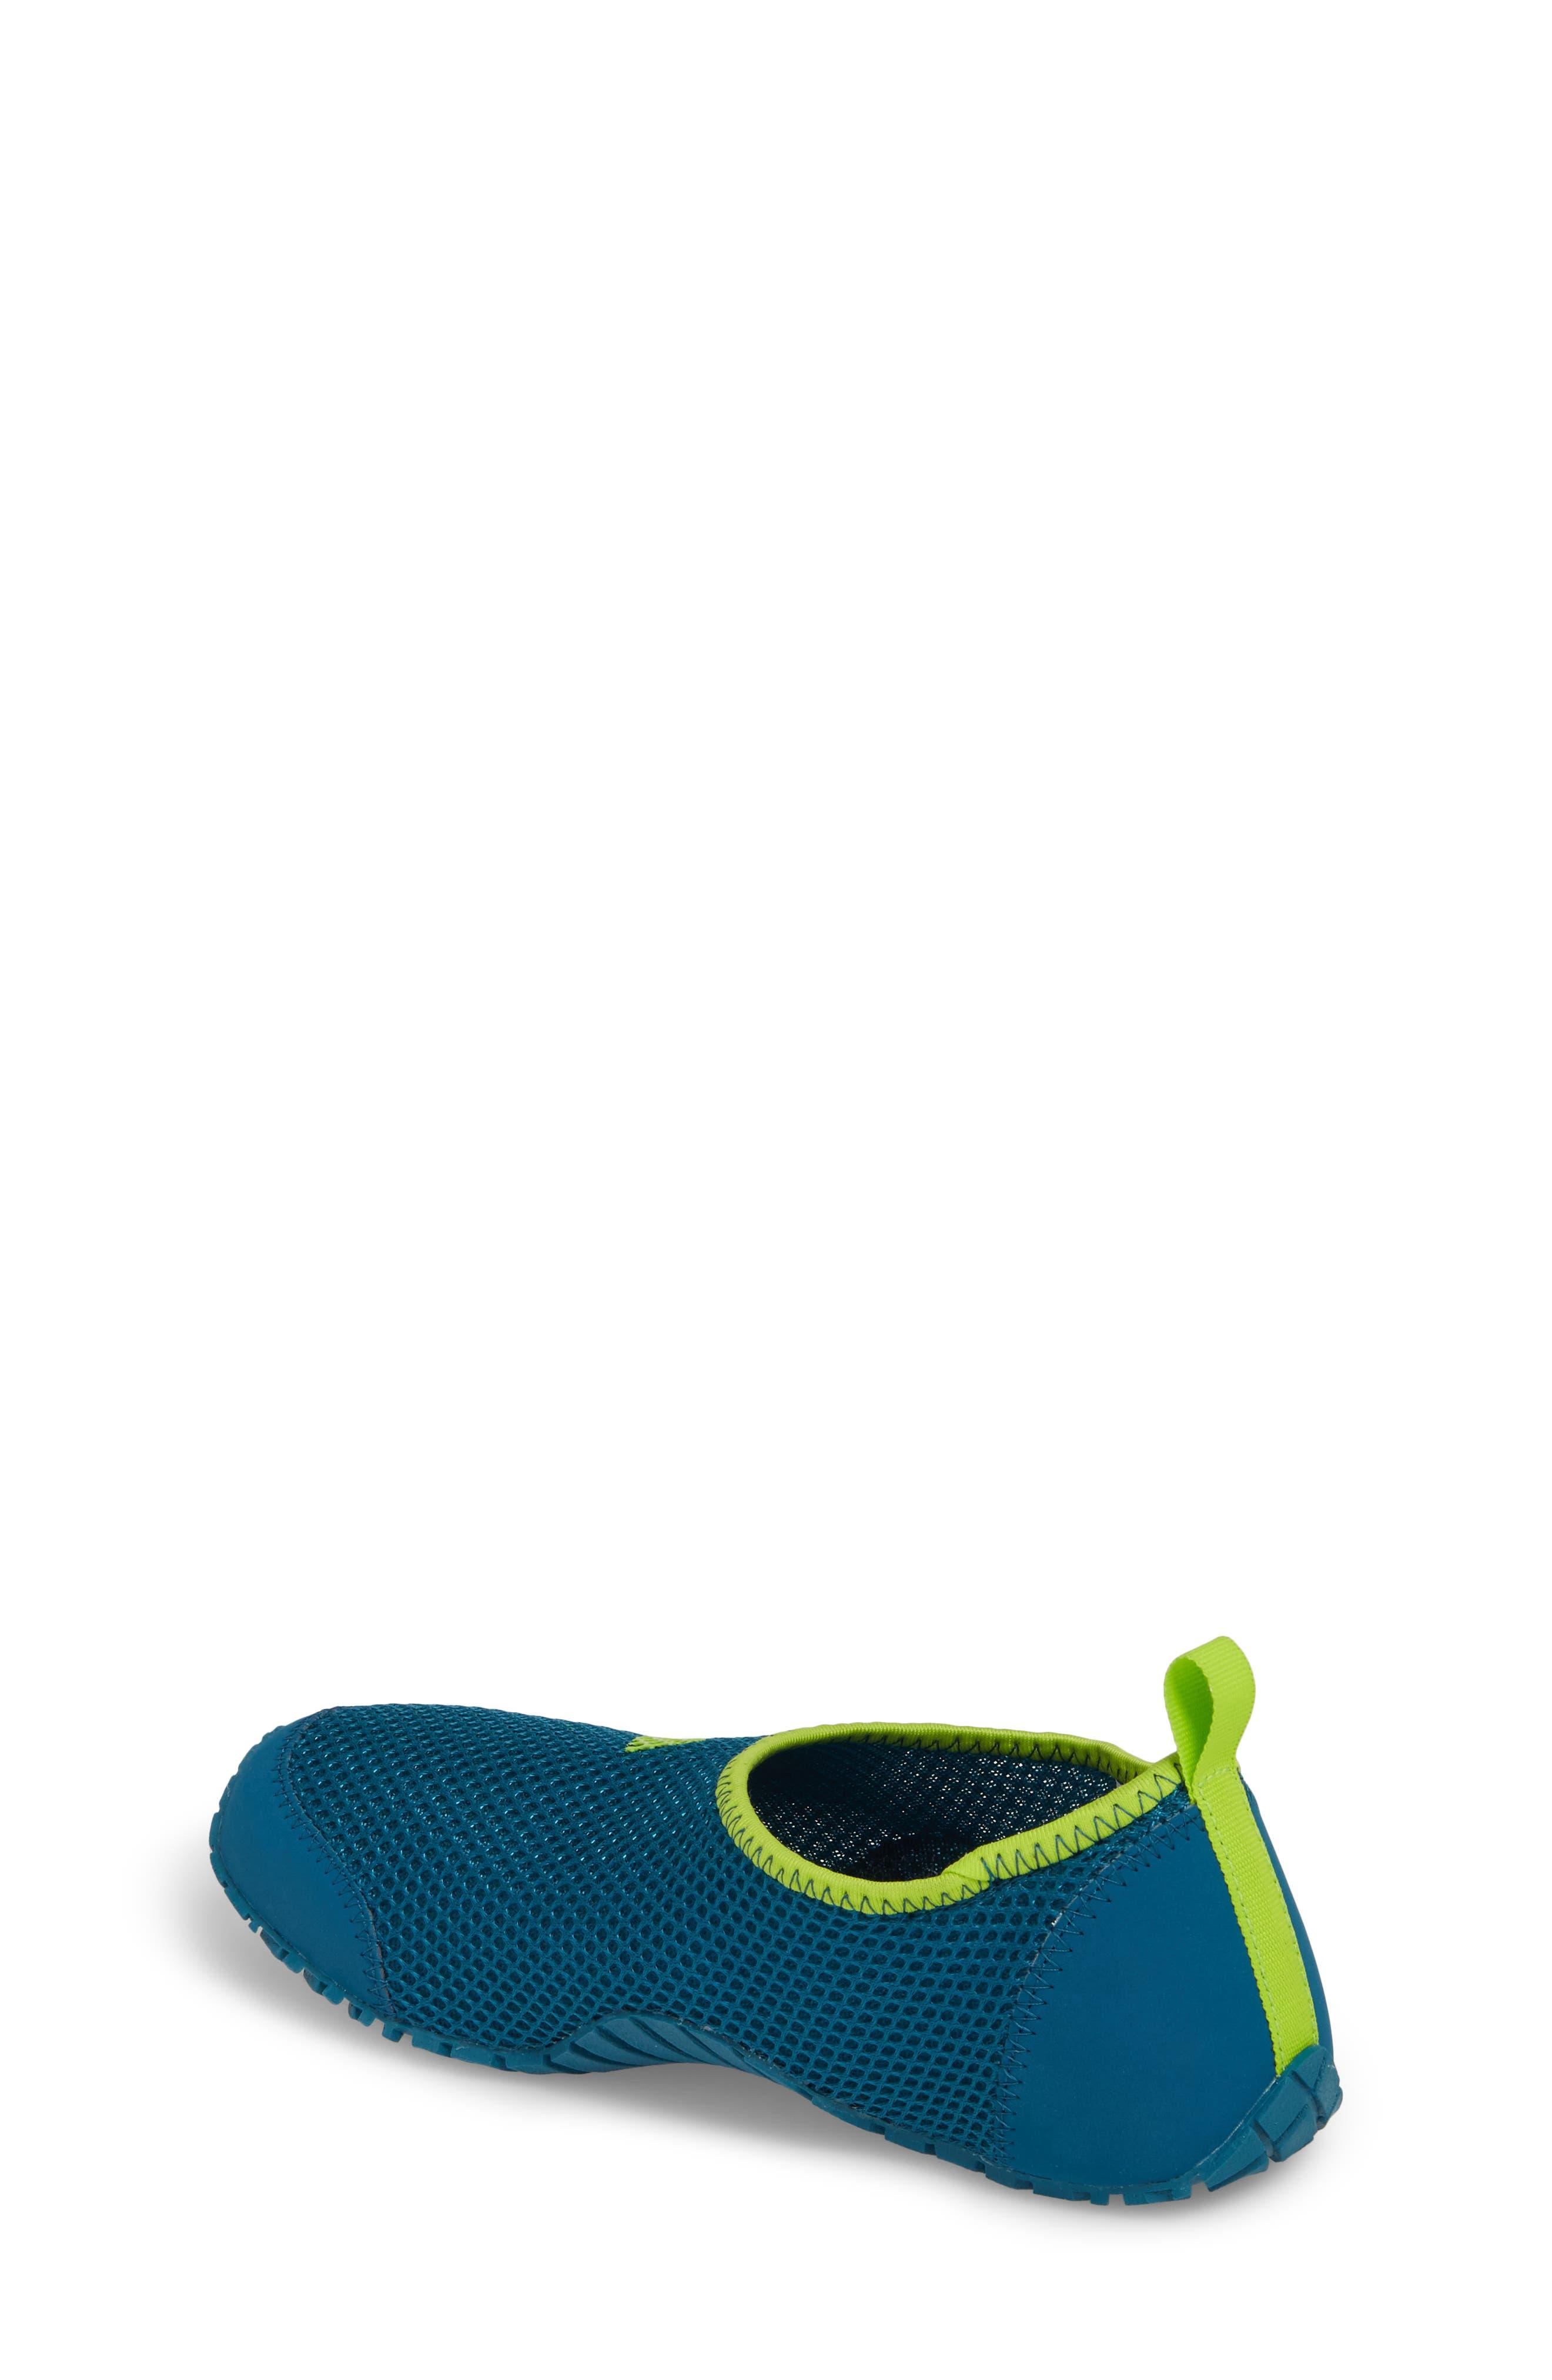 Kurobe Mesh Slip-On Water Shoe,                             Alternate thumbnail 2, color,                             Teal/ Petrol Night/ Solar